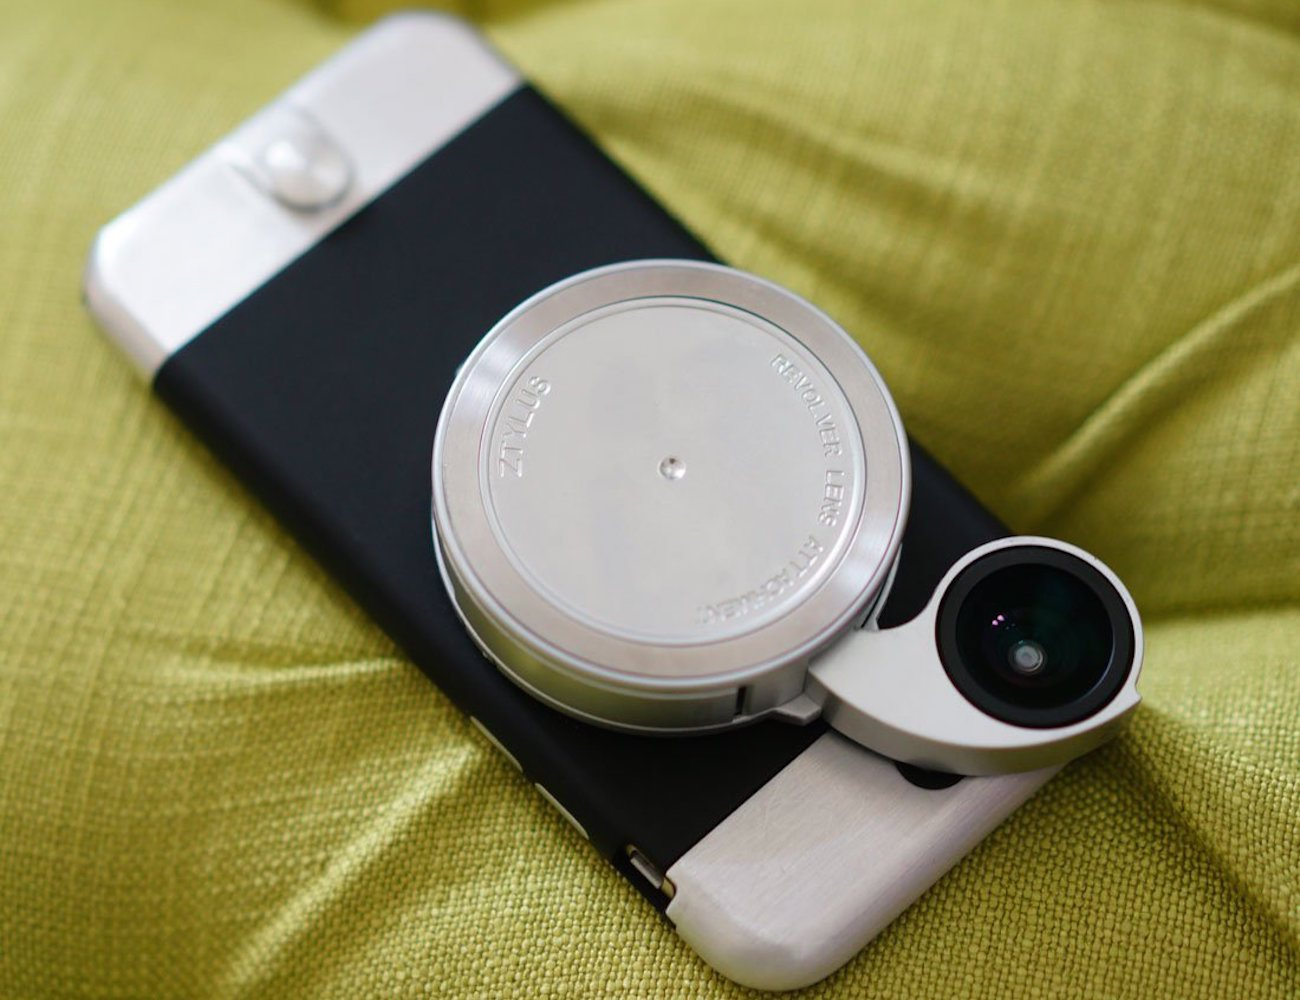 Ztylus+%26%238211%3B+IPhone+6+Plus+Metal+Case+And+Lens+Adapter+Kit